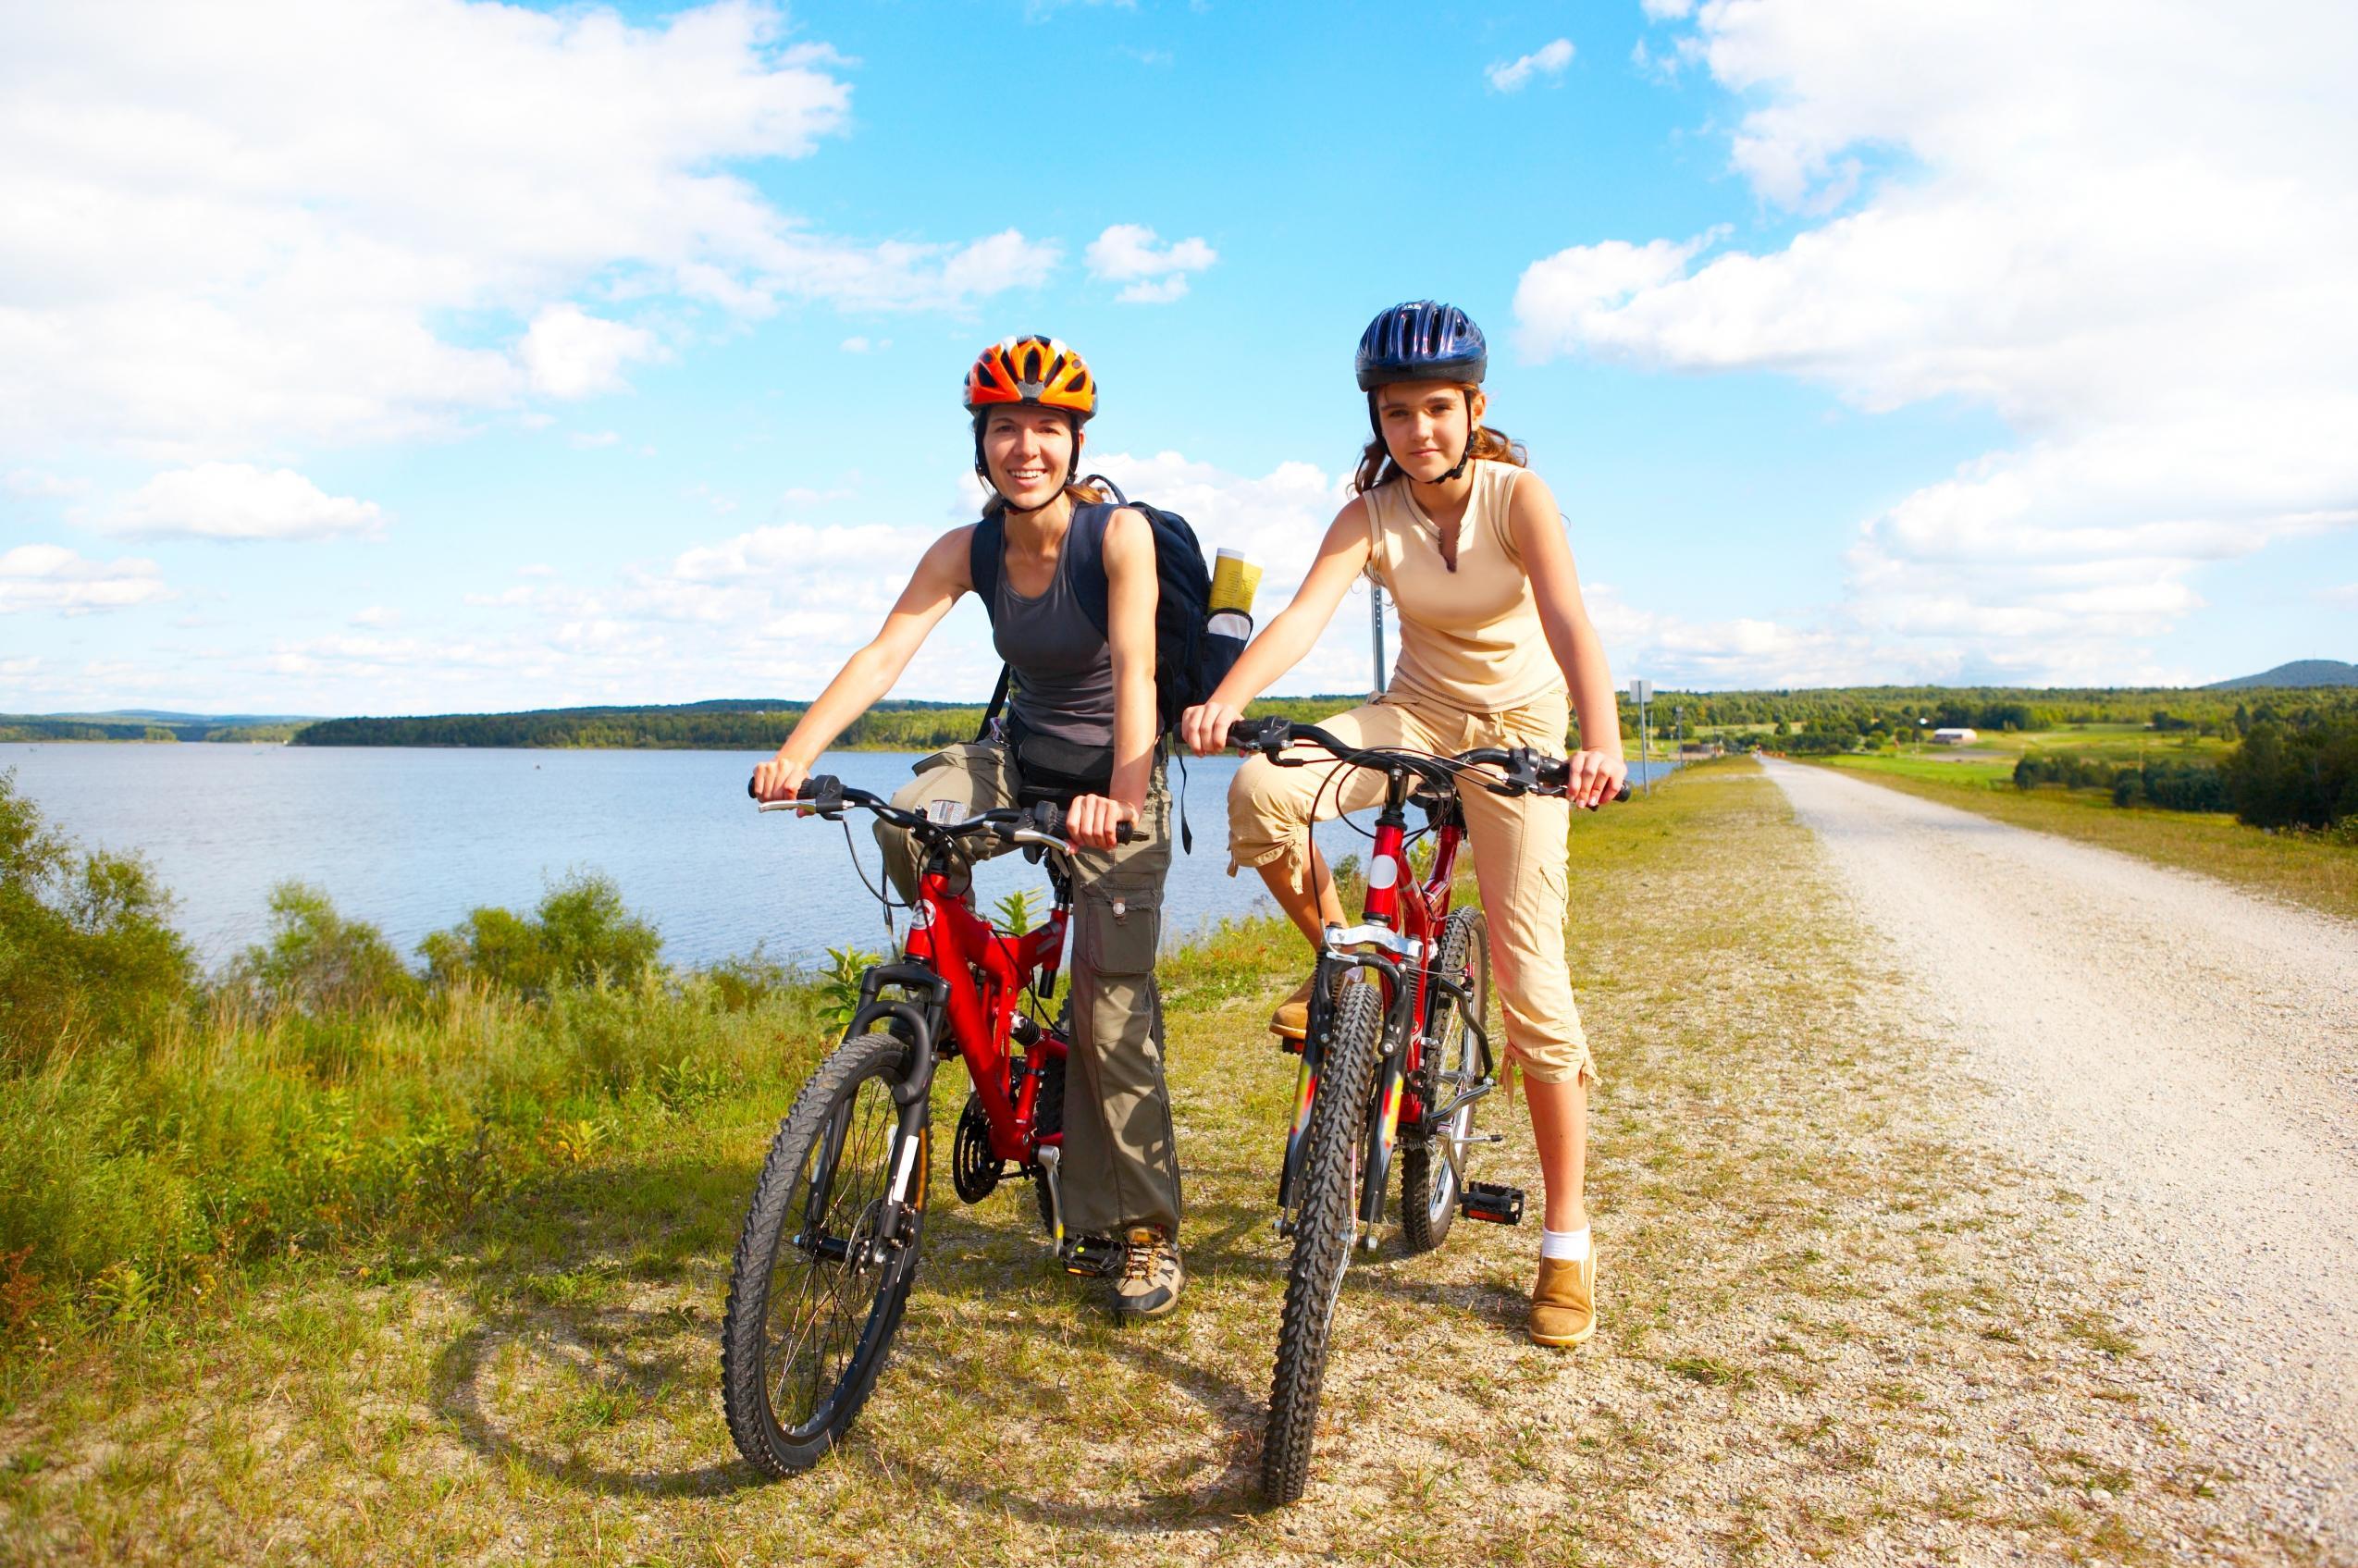 две девушки на велосипедах